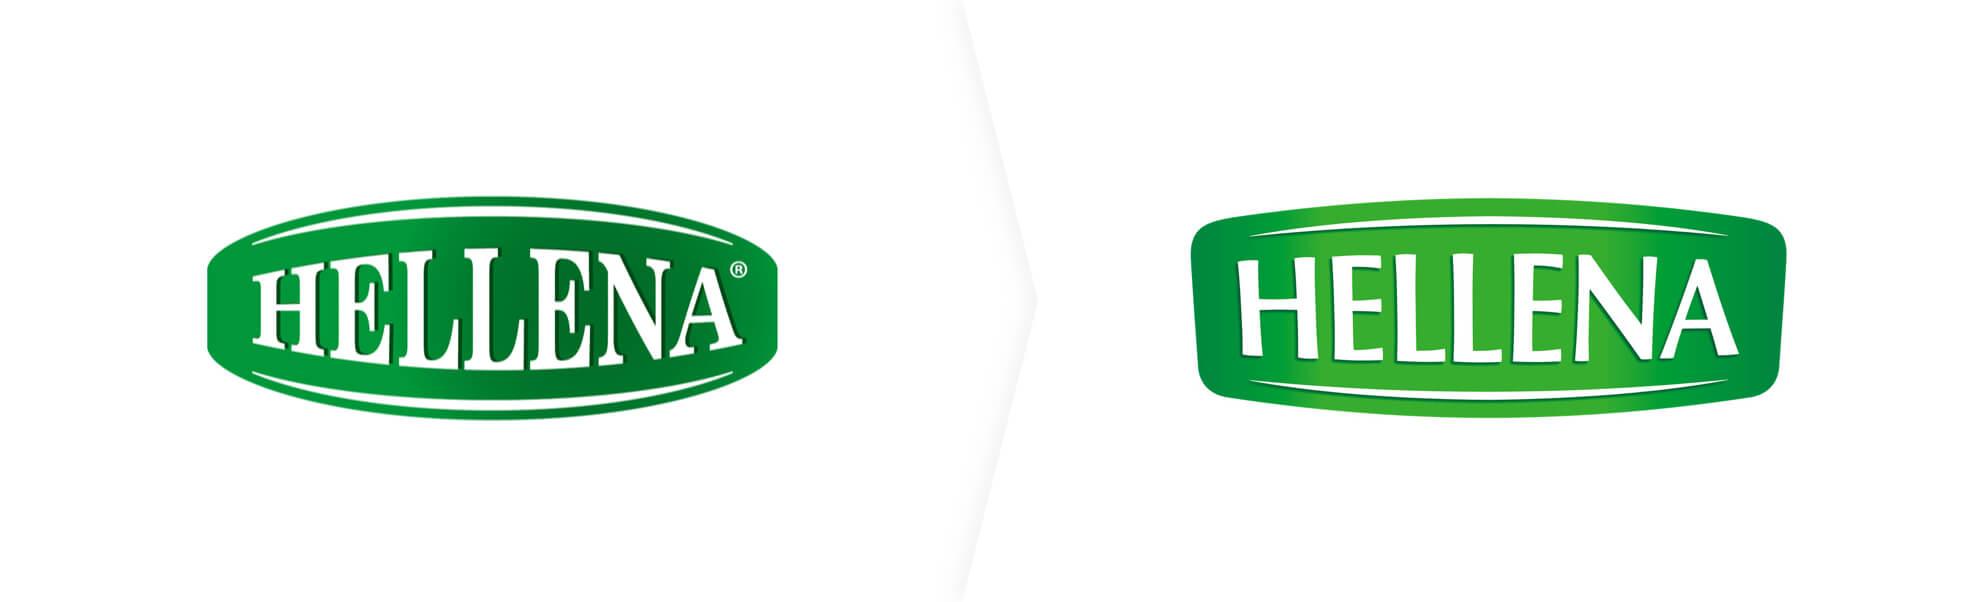 Stare i nowe logo Helleny